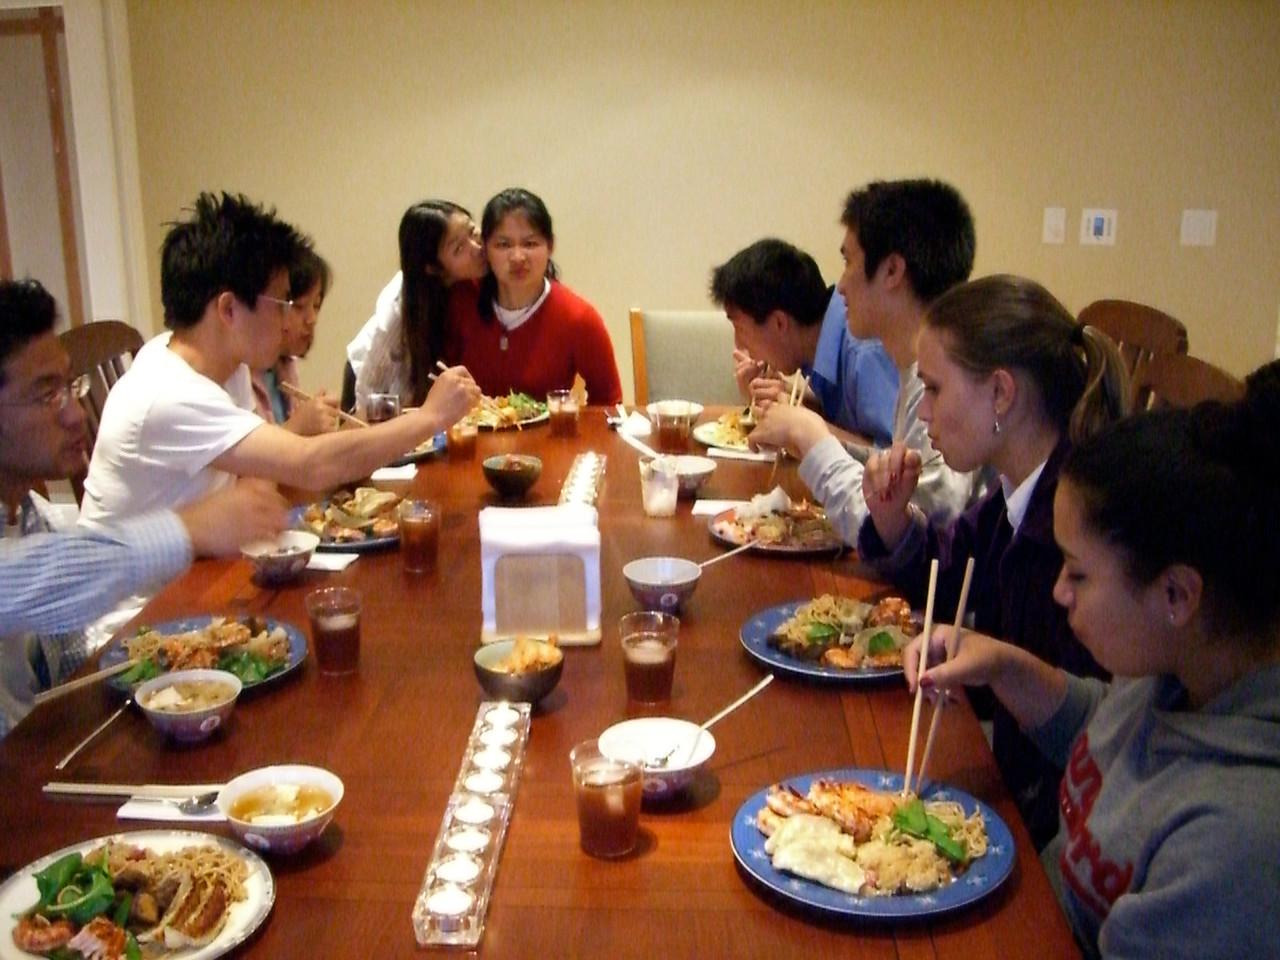 2006 04 23 Sun - Tmony @ The Kim's for dinner 2